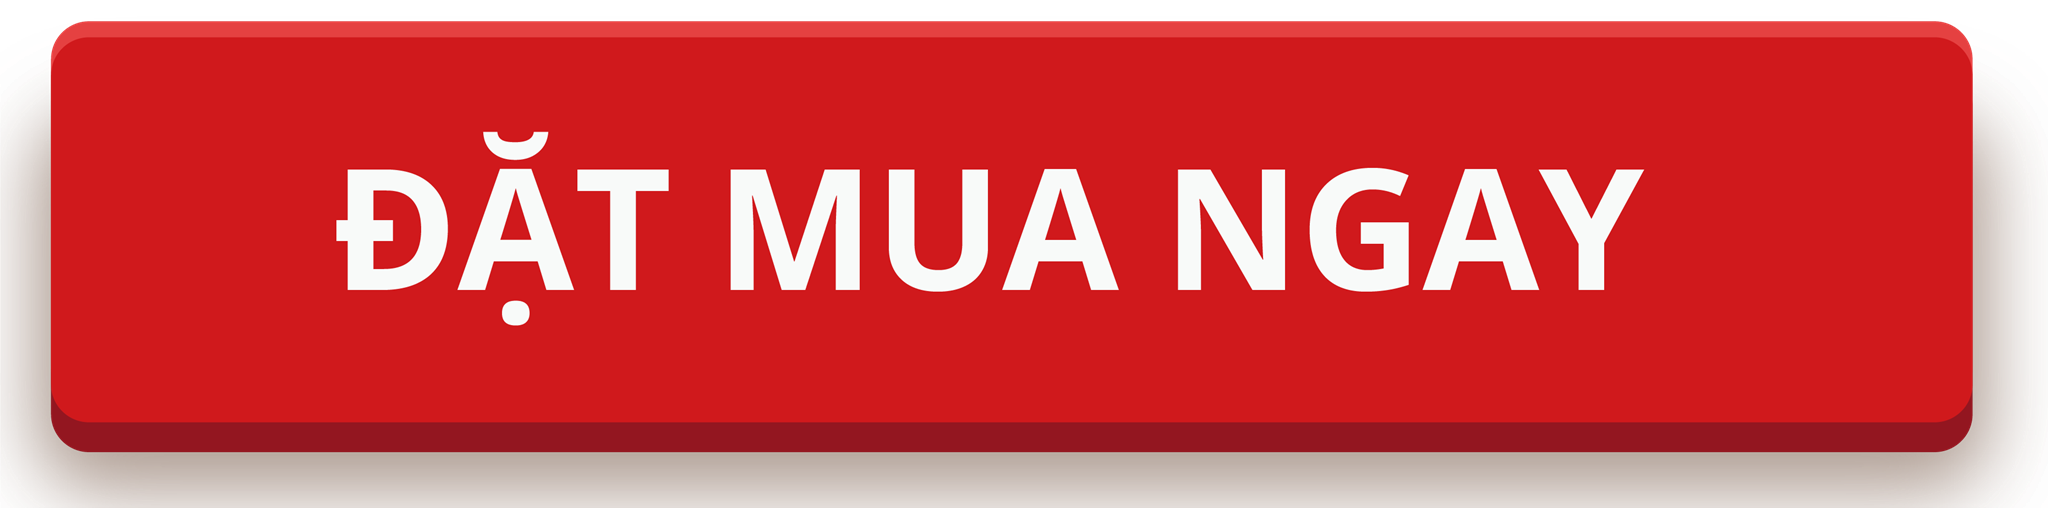 datmua-VNK.png